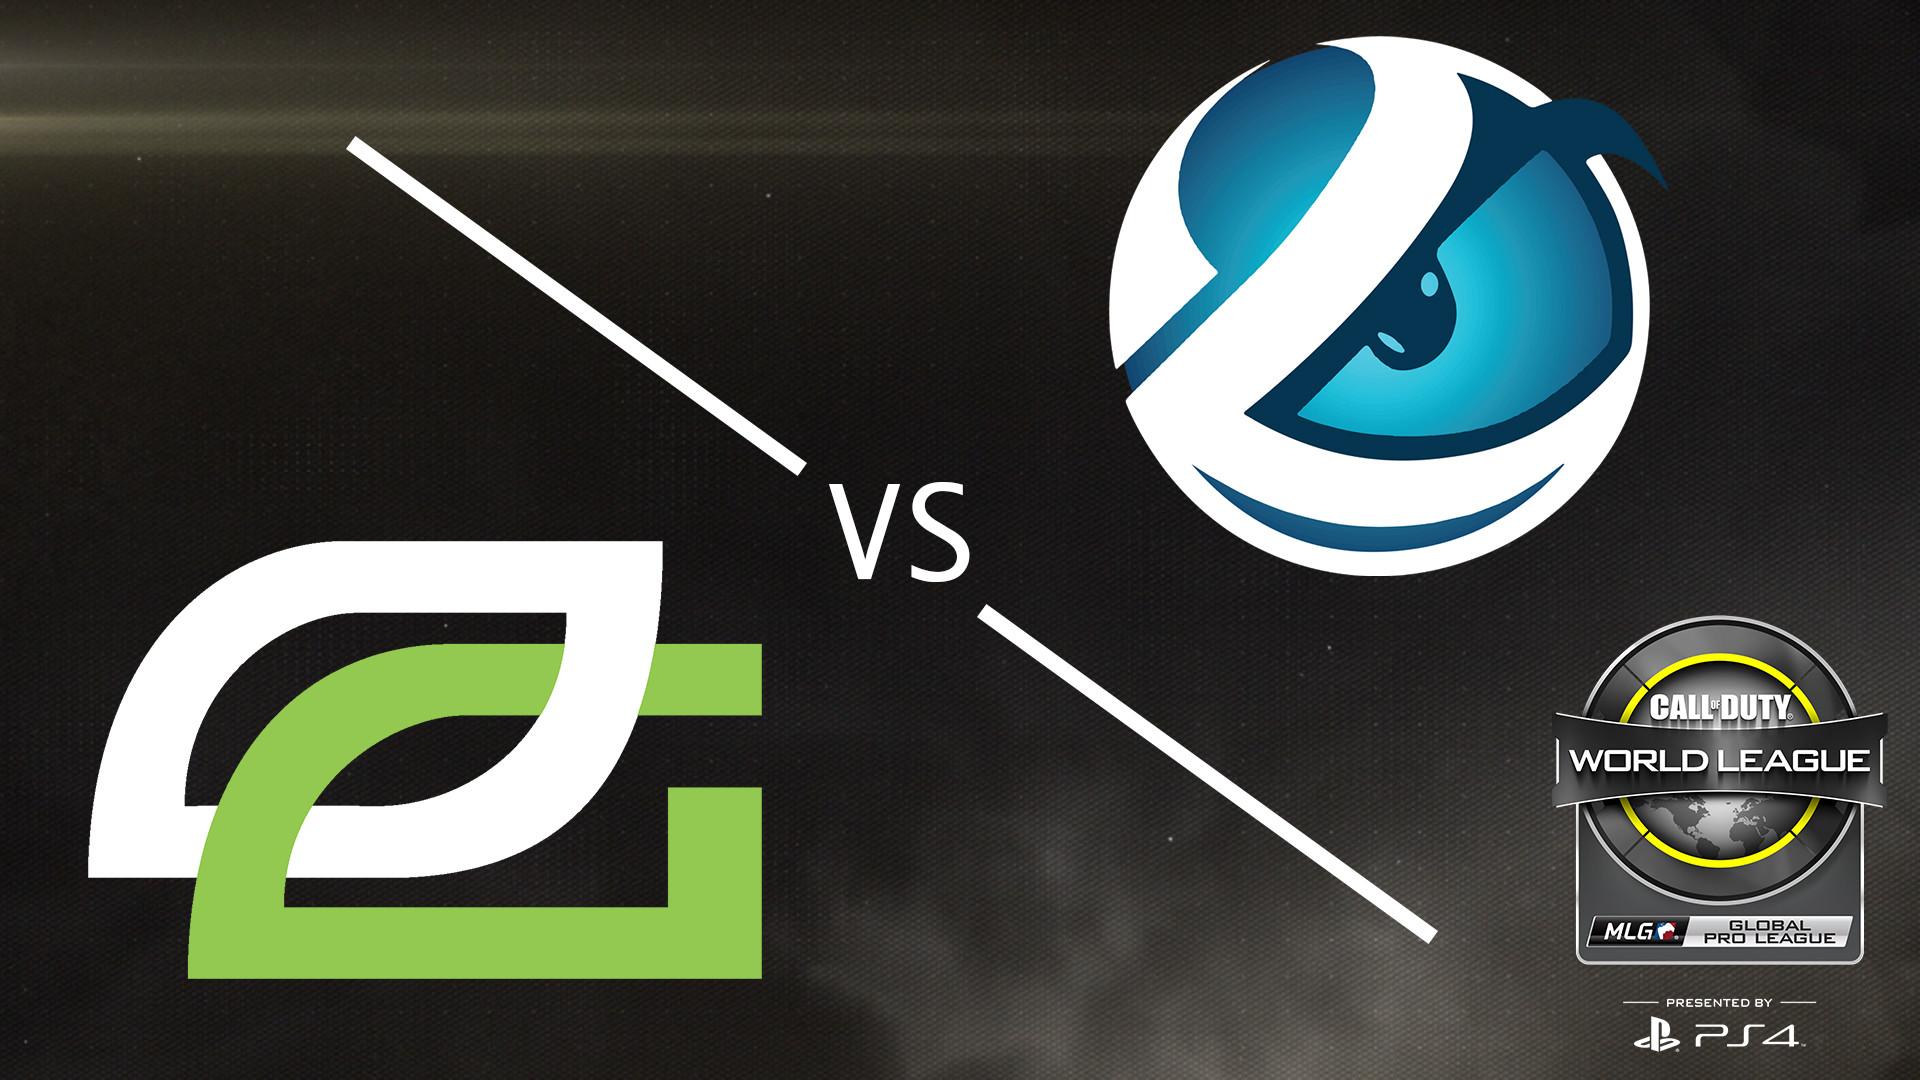 OpTic Gaming vs Luminosity – CWL GPL Stage 2 Playoffs – Day 3